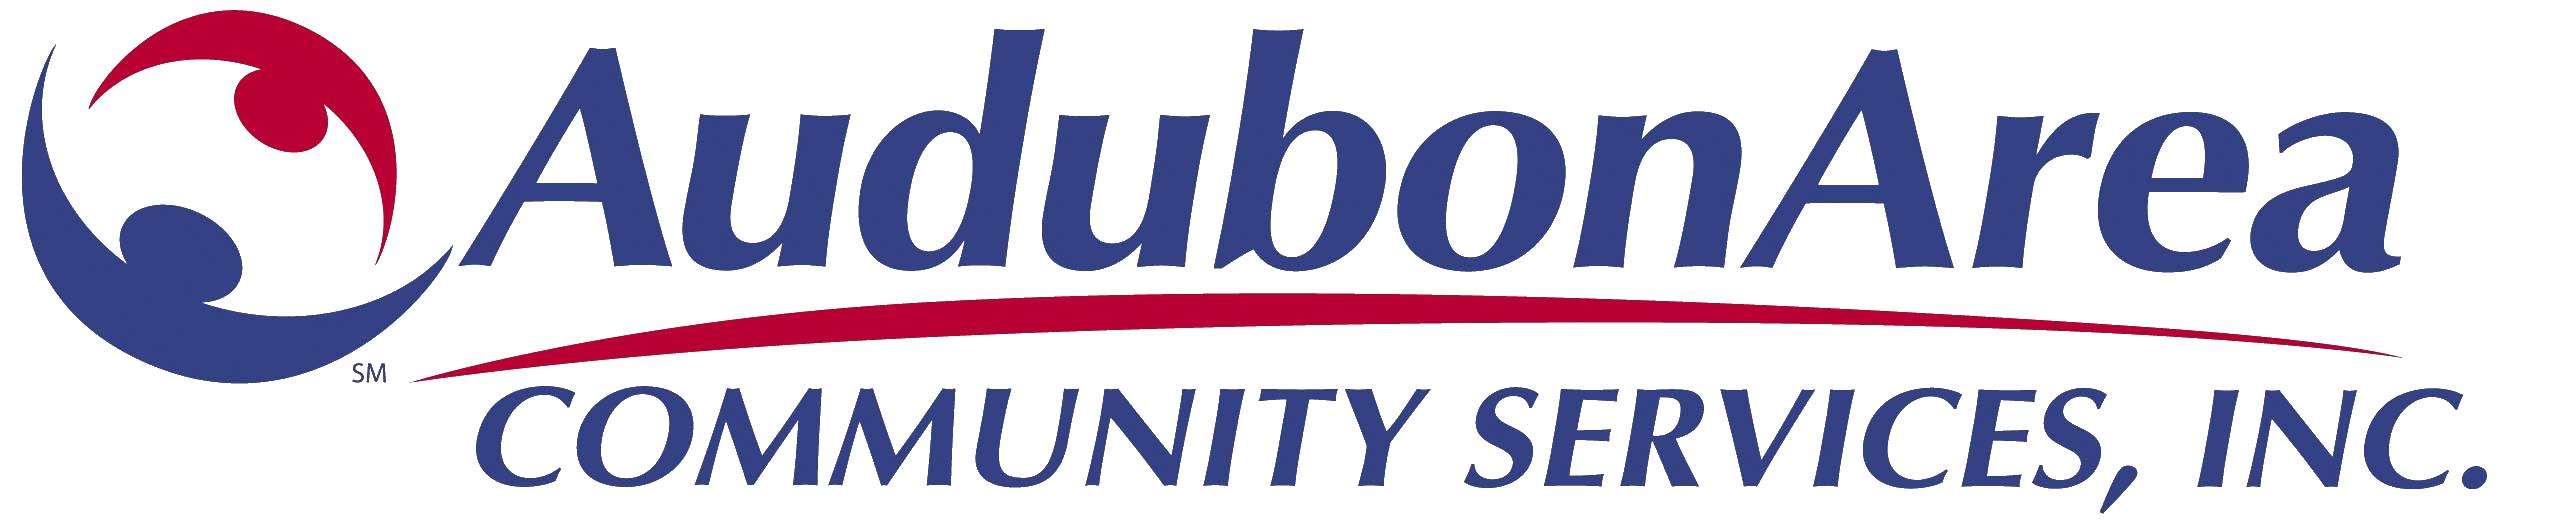 Audubon Area Community Services logo